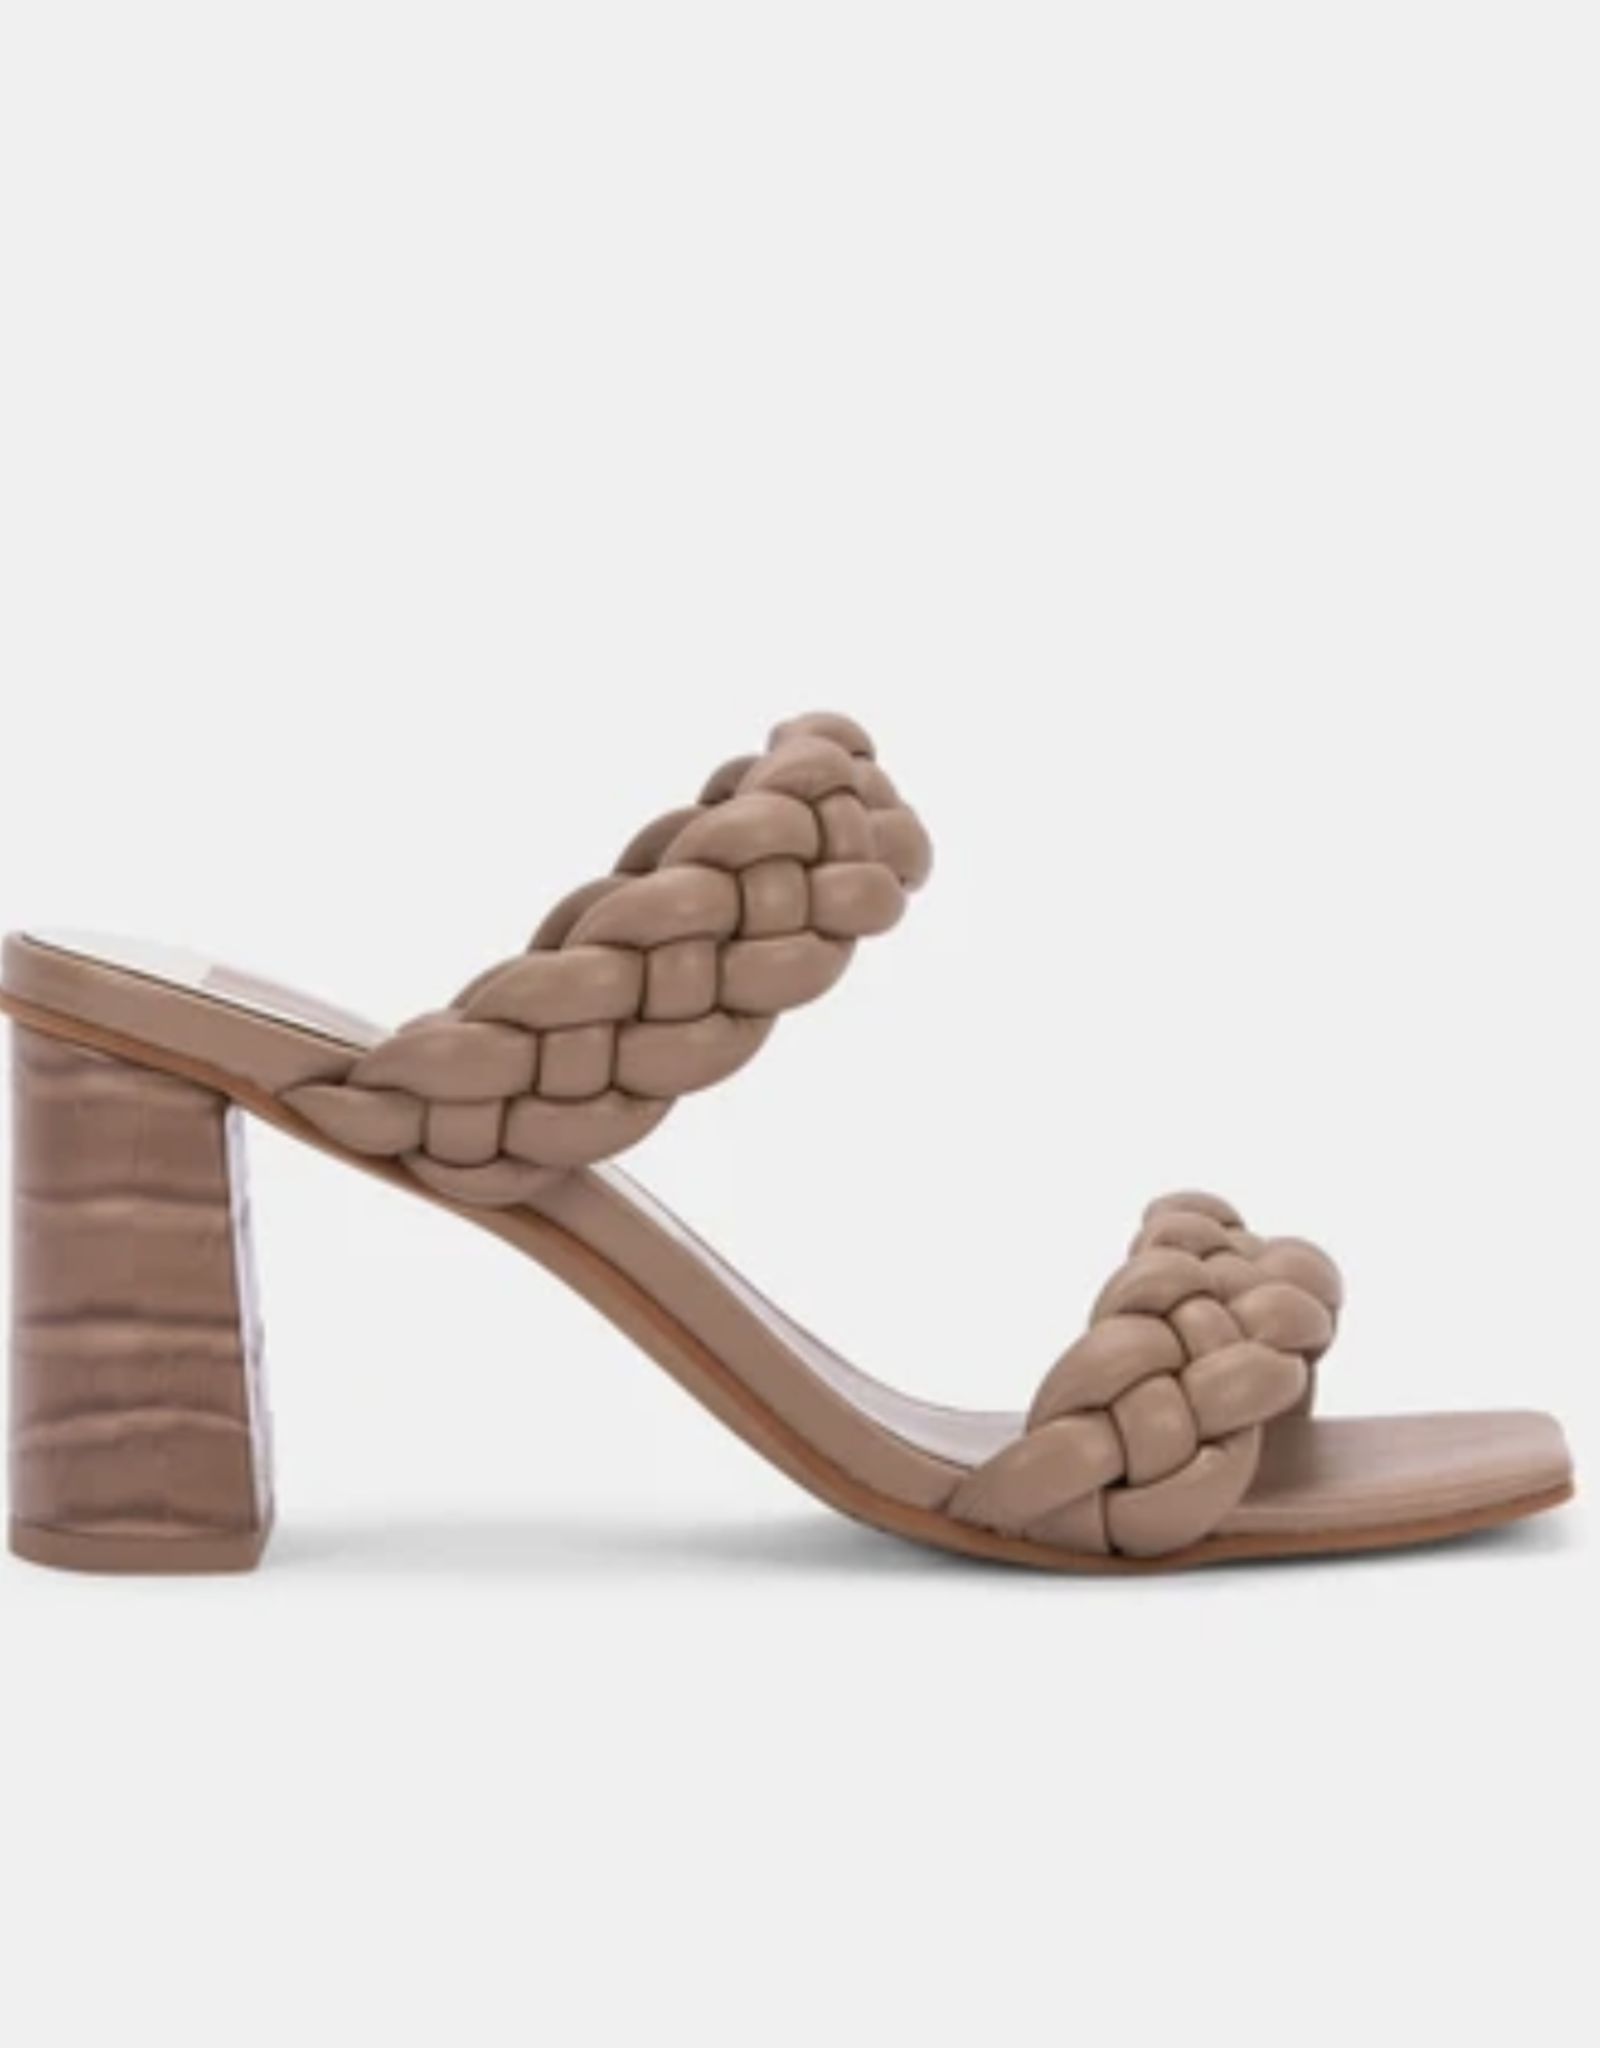 Dolce Vita Paily Heels